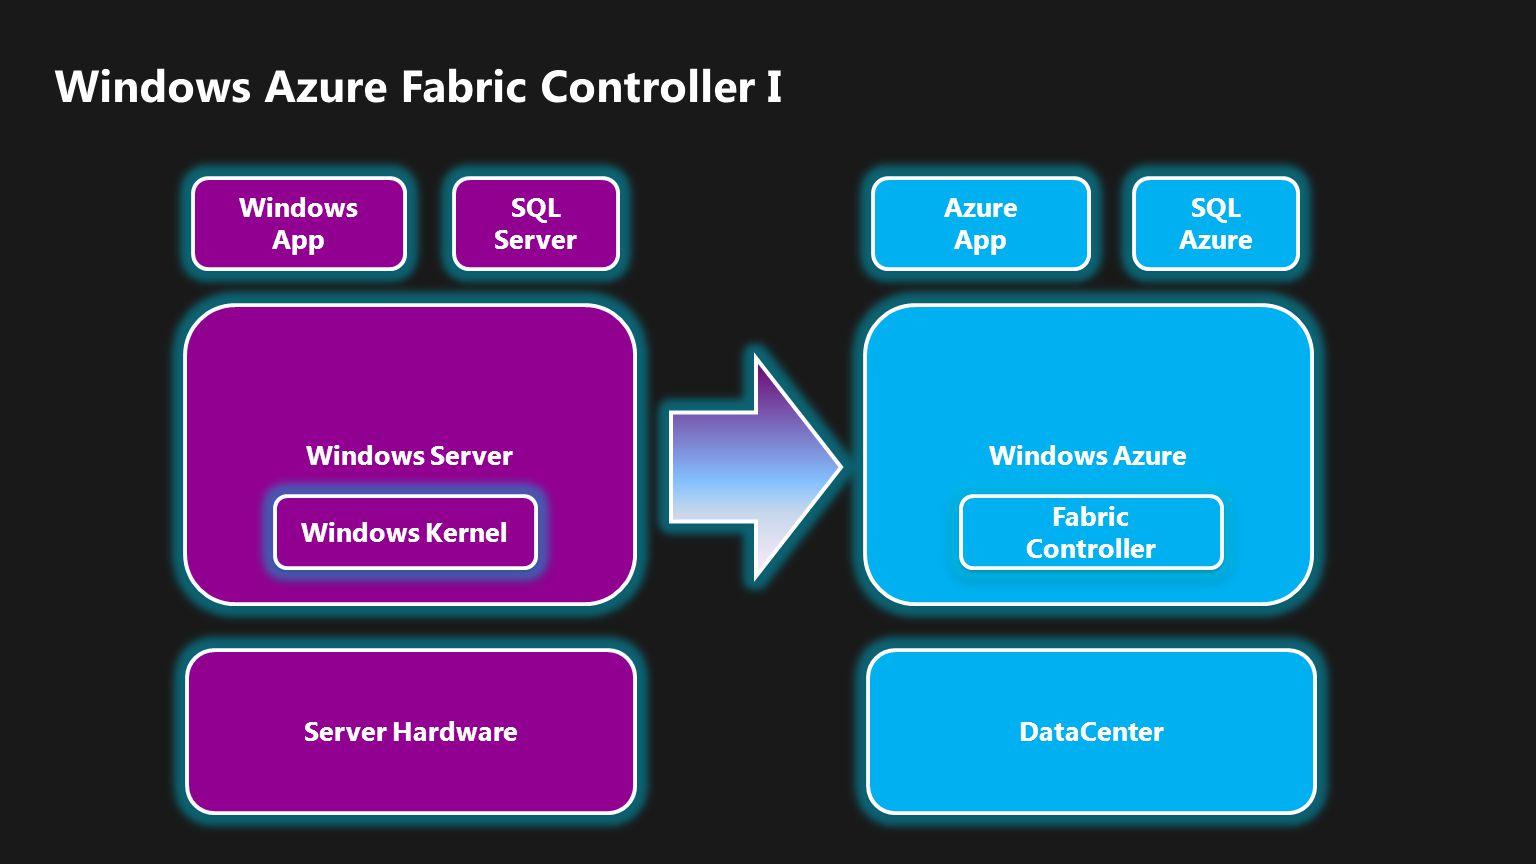 Windows Azure Fabric Controller I